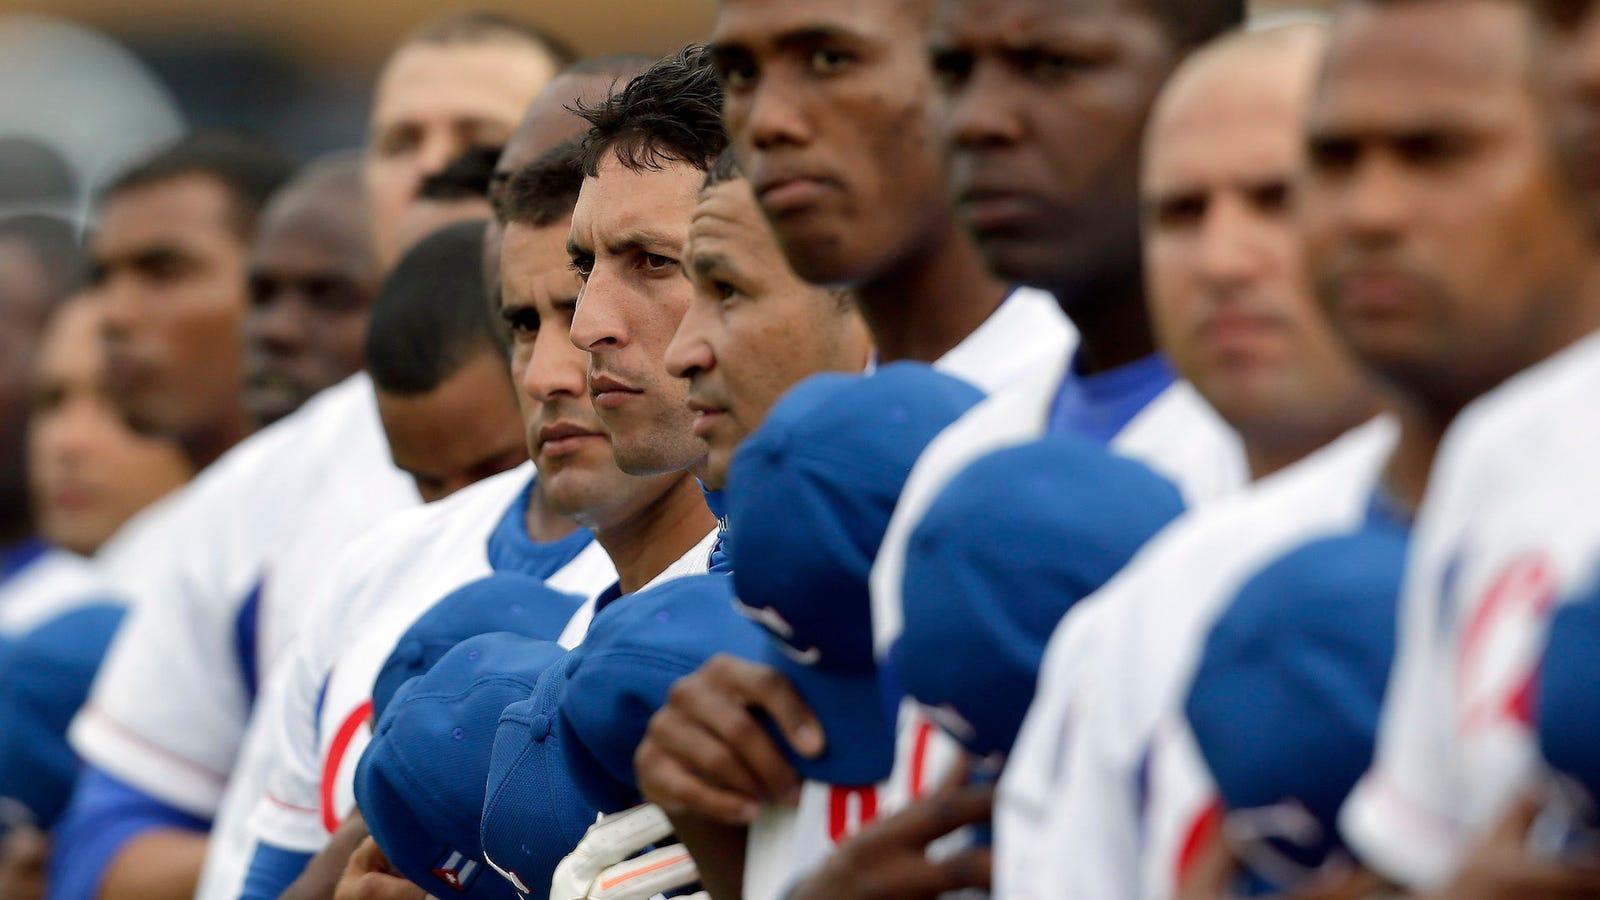 smuggling cuban baseball players essay